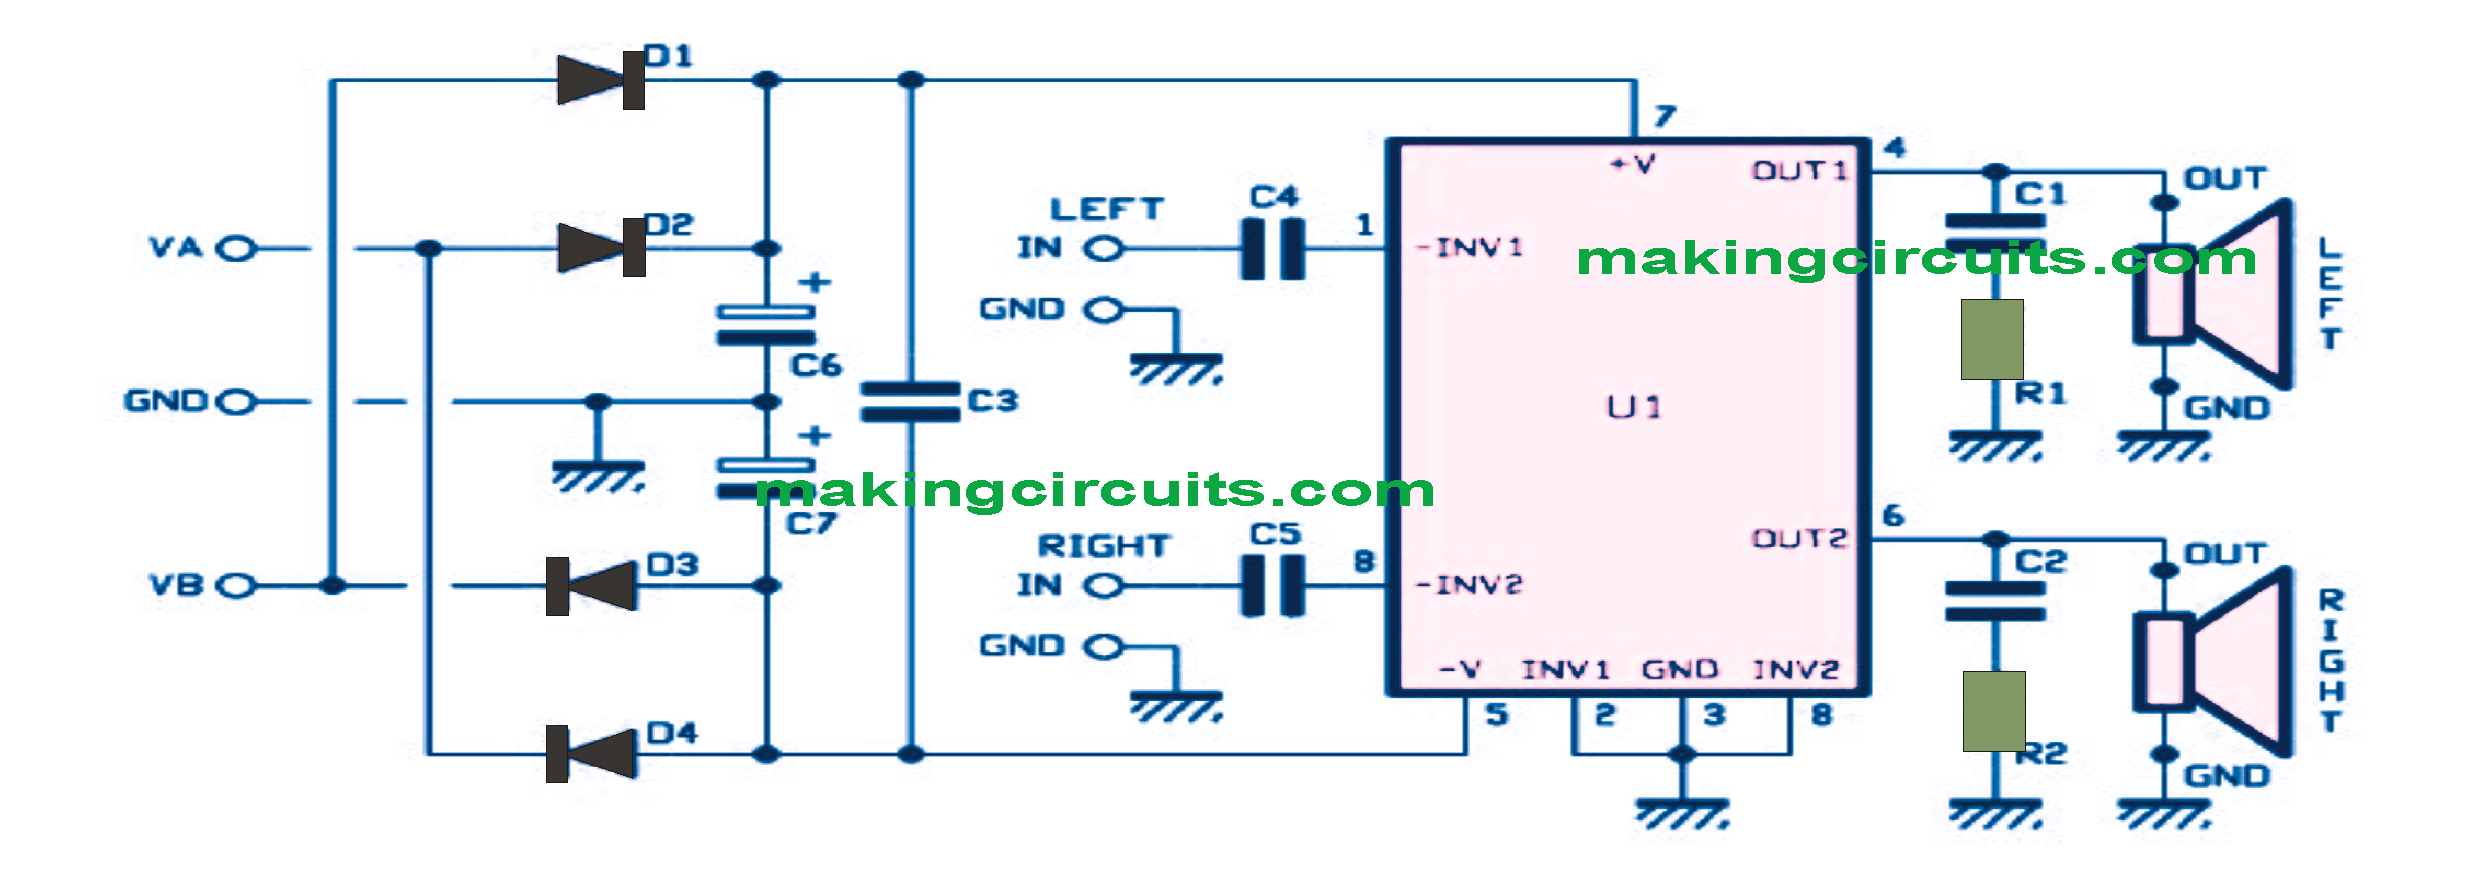 30 Watt Stereo Amplifier Circuit Using Ic Tda1521 Digital Long Time Delay Amplifiercircuit Diagram